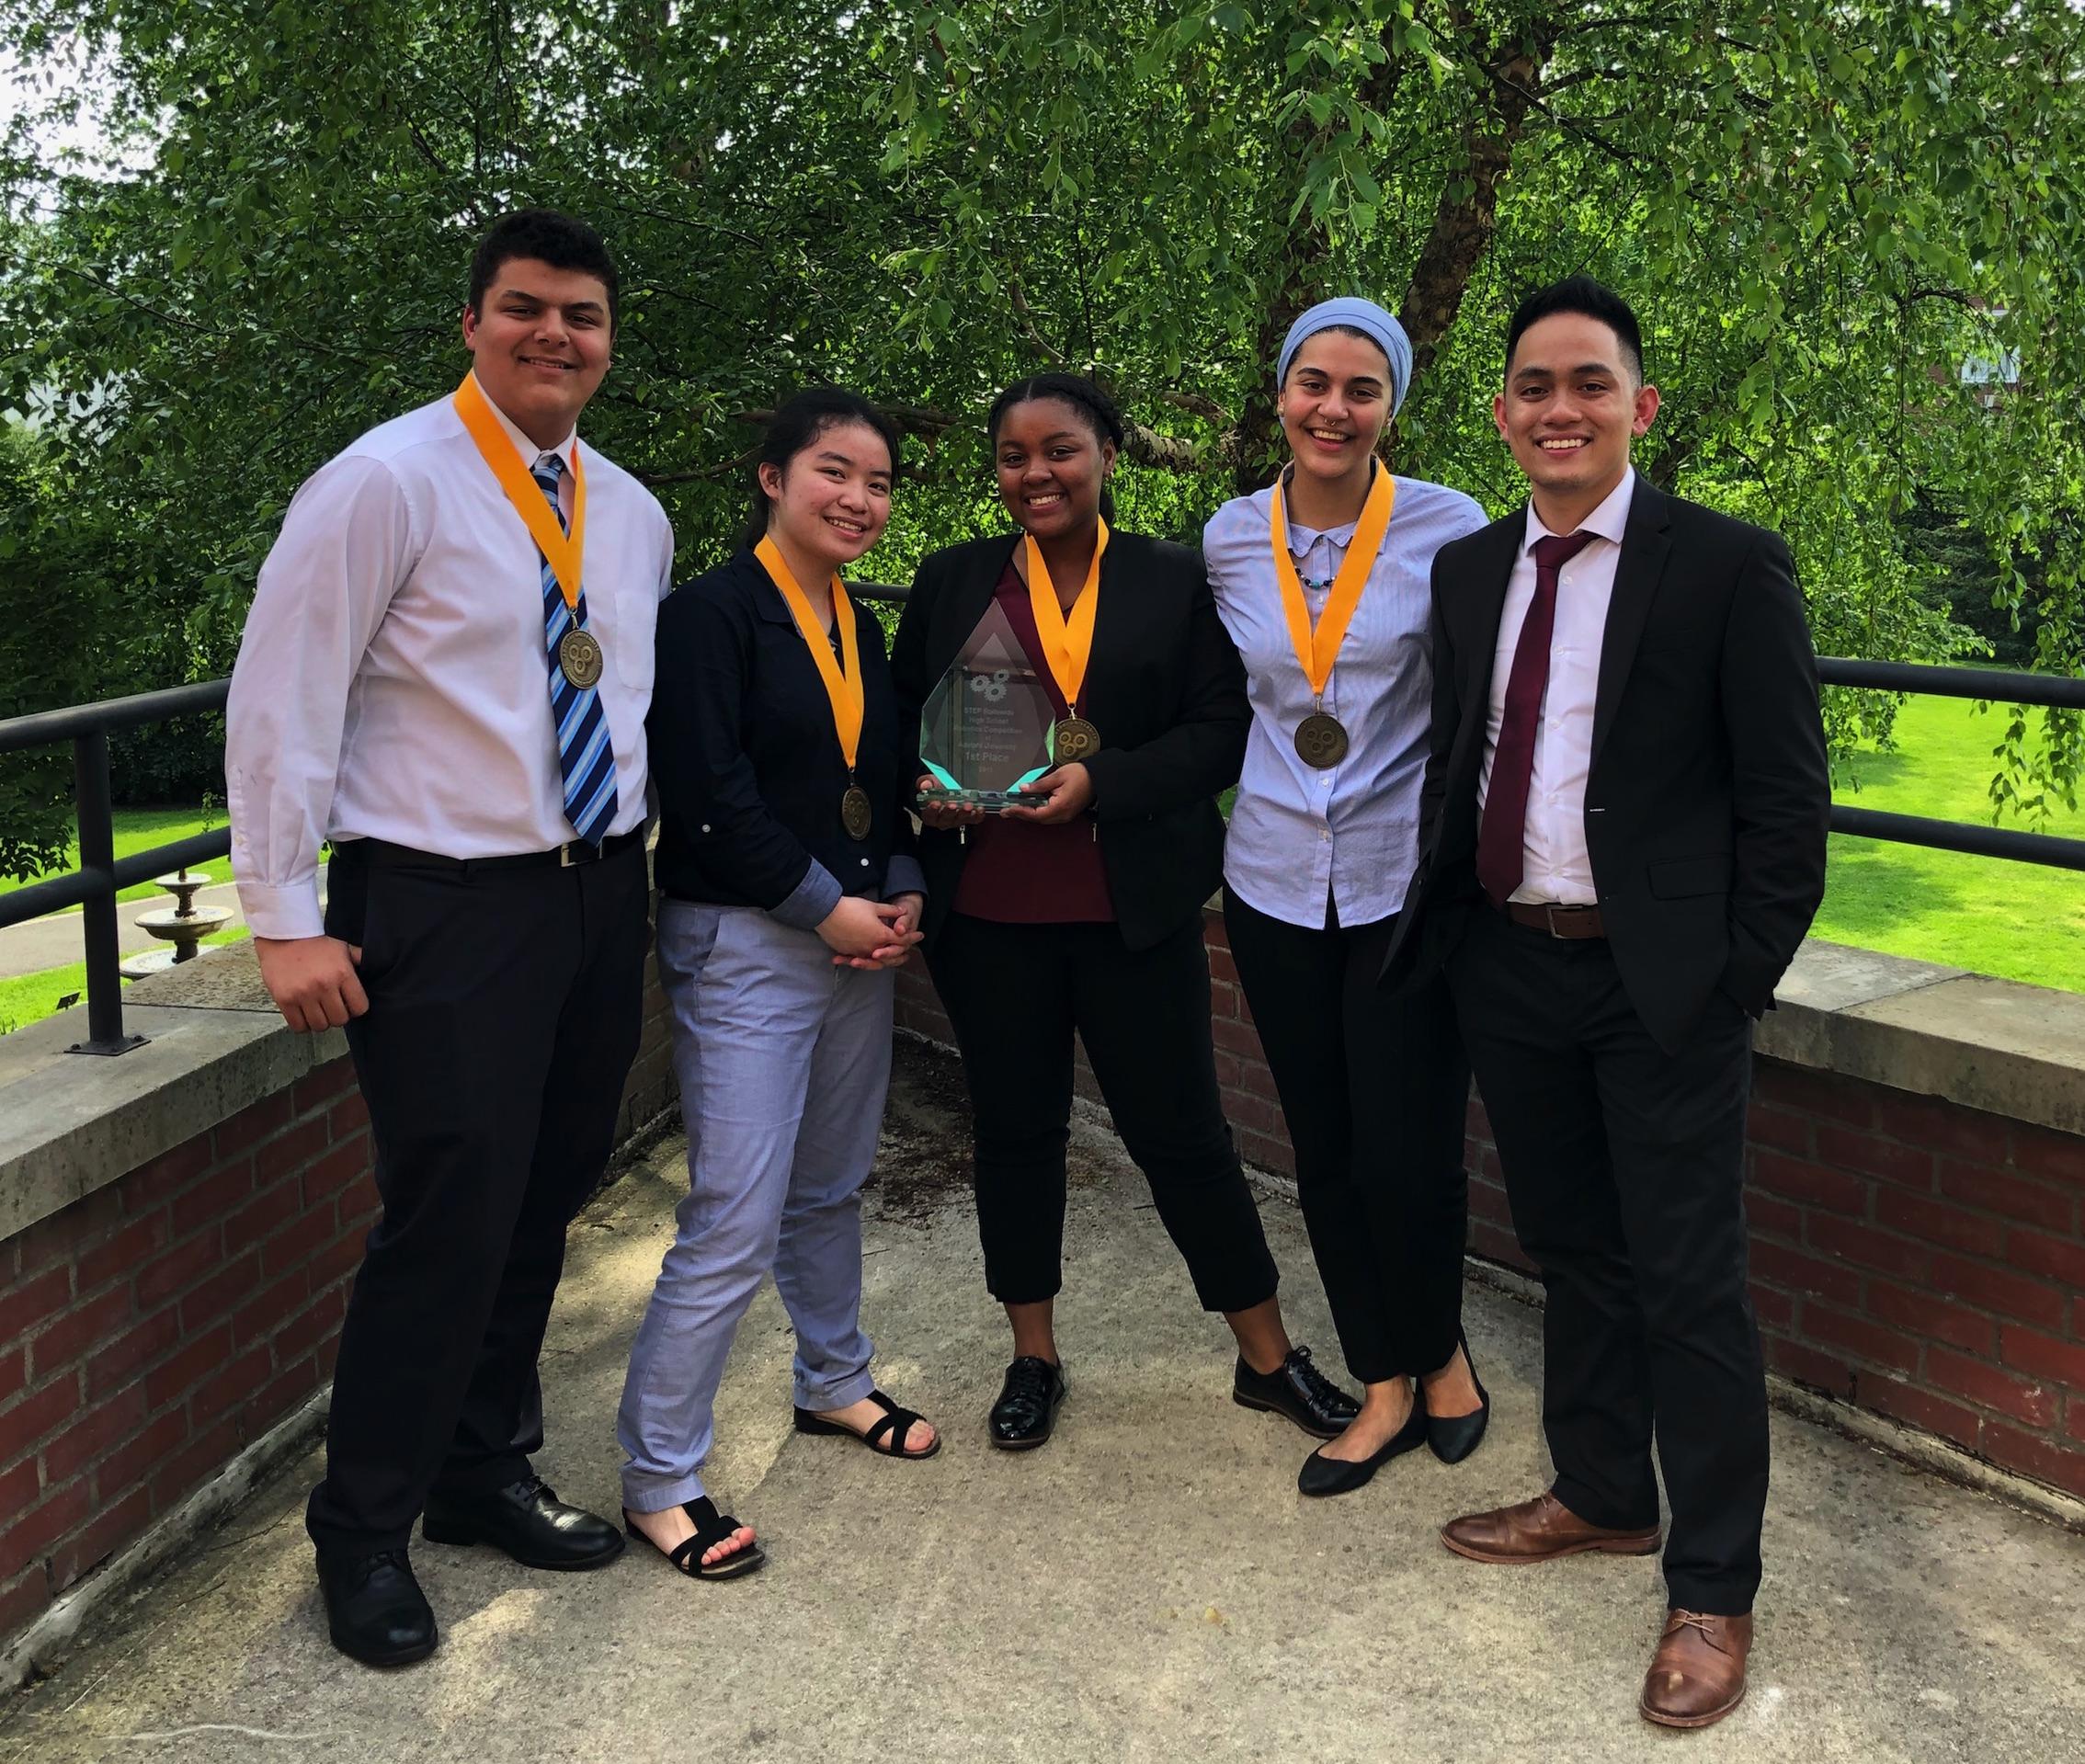 Left to right: Muhammad Soliman, Carol Pan, Aliana Wilson, Omnia Soliman, and Gabriel Salvador (STEP Coordinator)